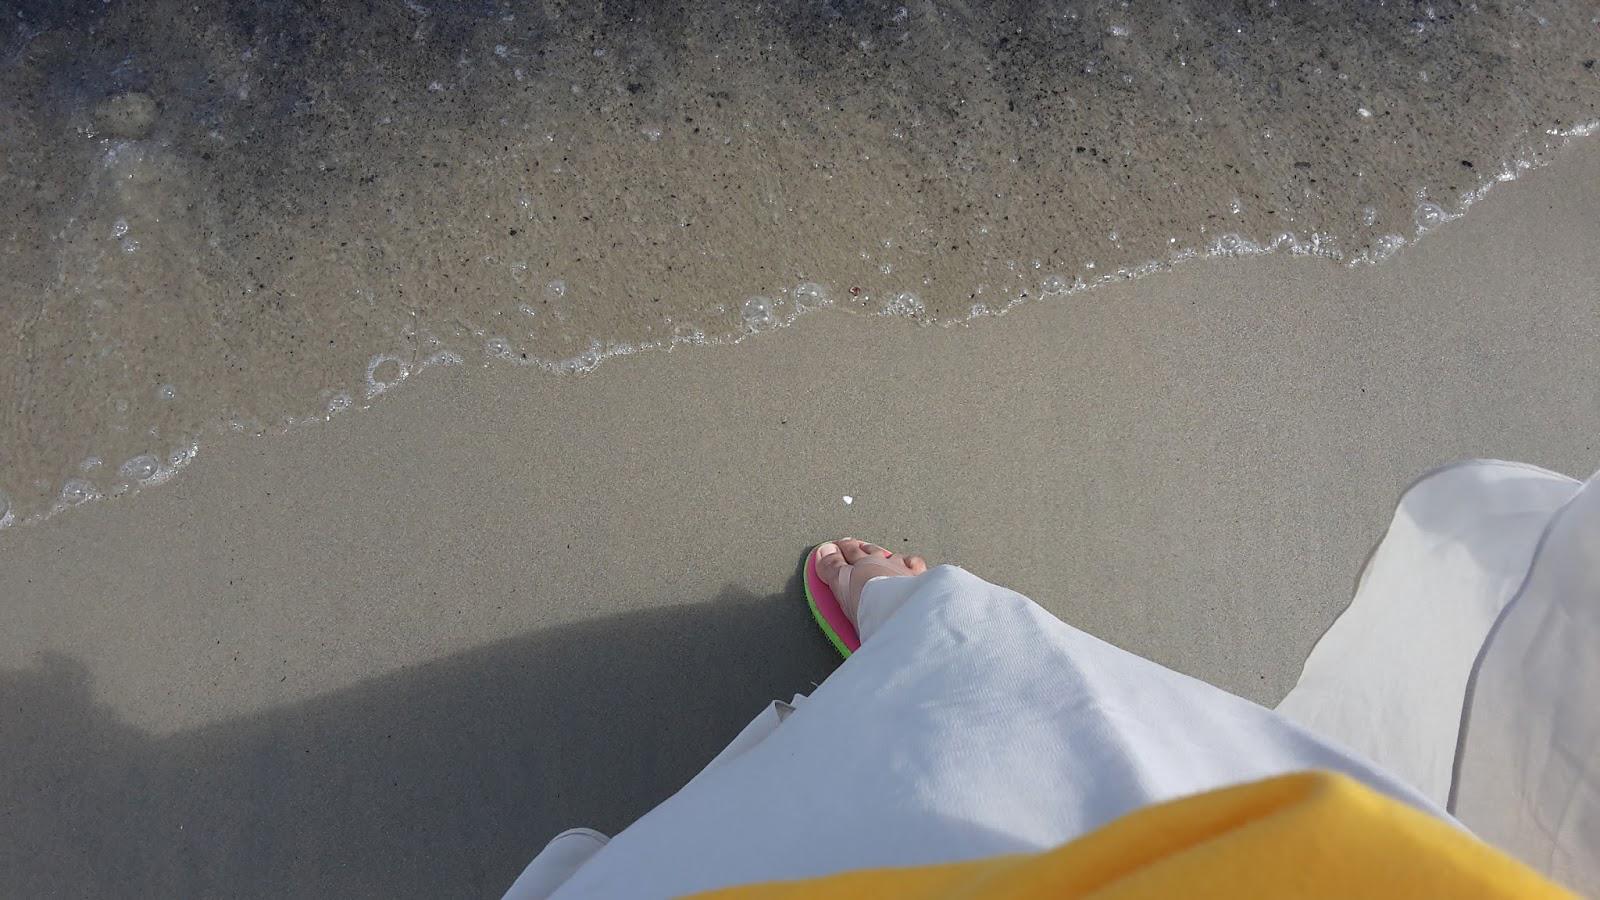 jadwal pesta pantai pagatan 2018 2019 20120 wisata pantai indah kalimantan selatan